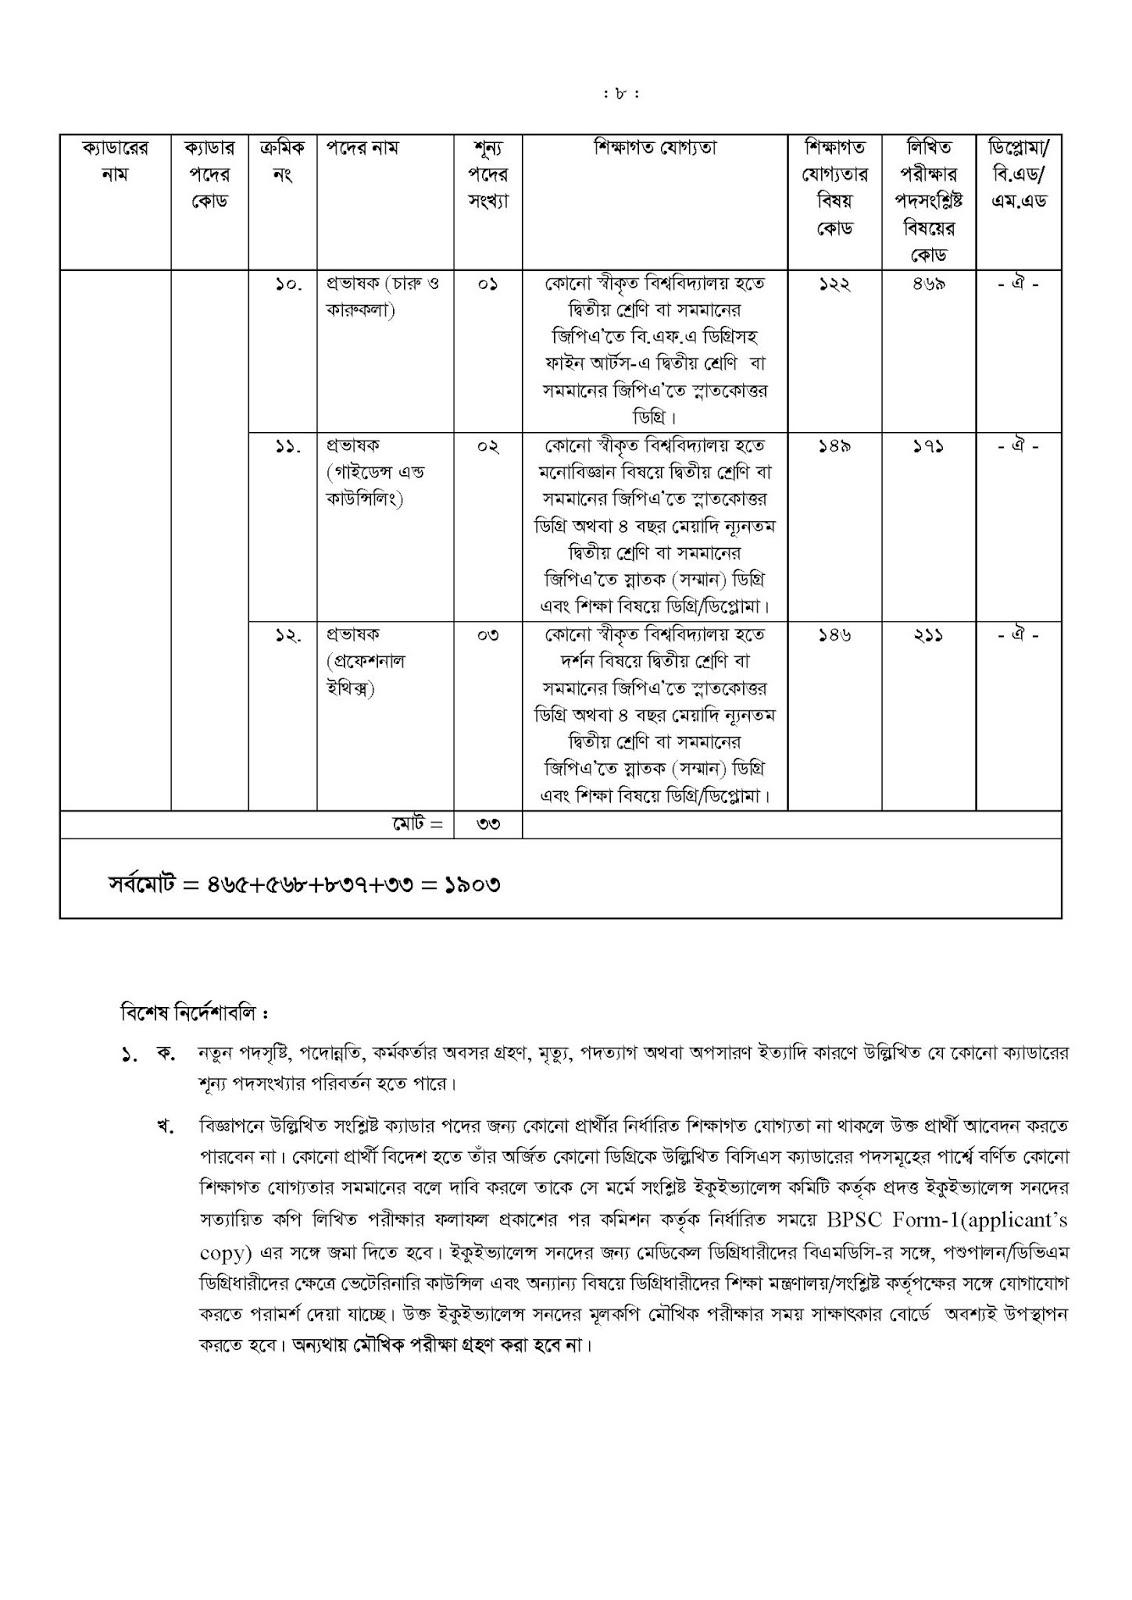 36th bcs admitcard